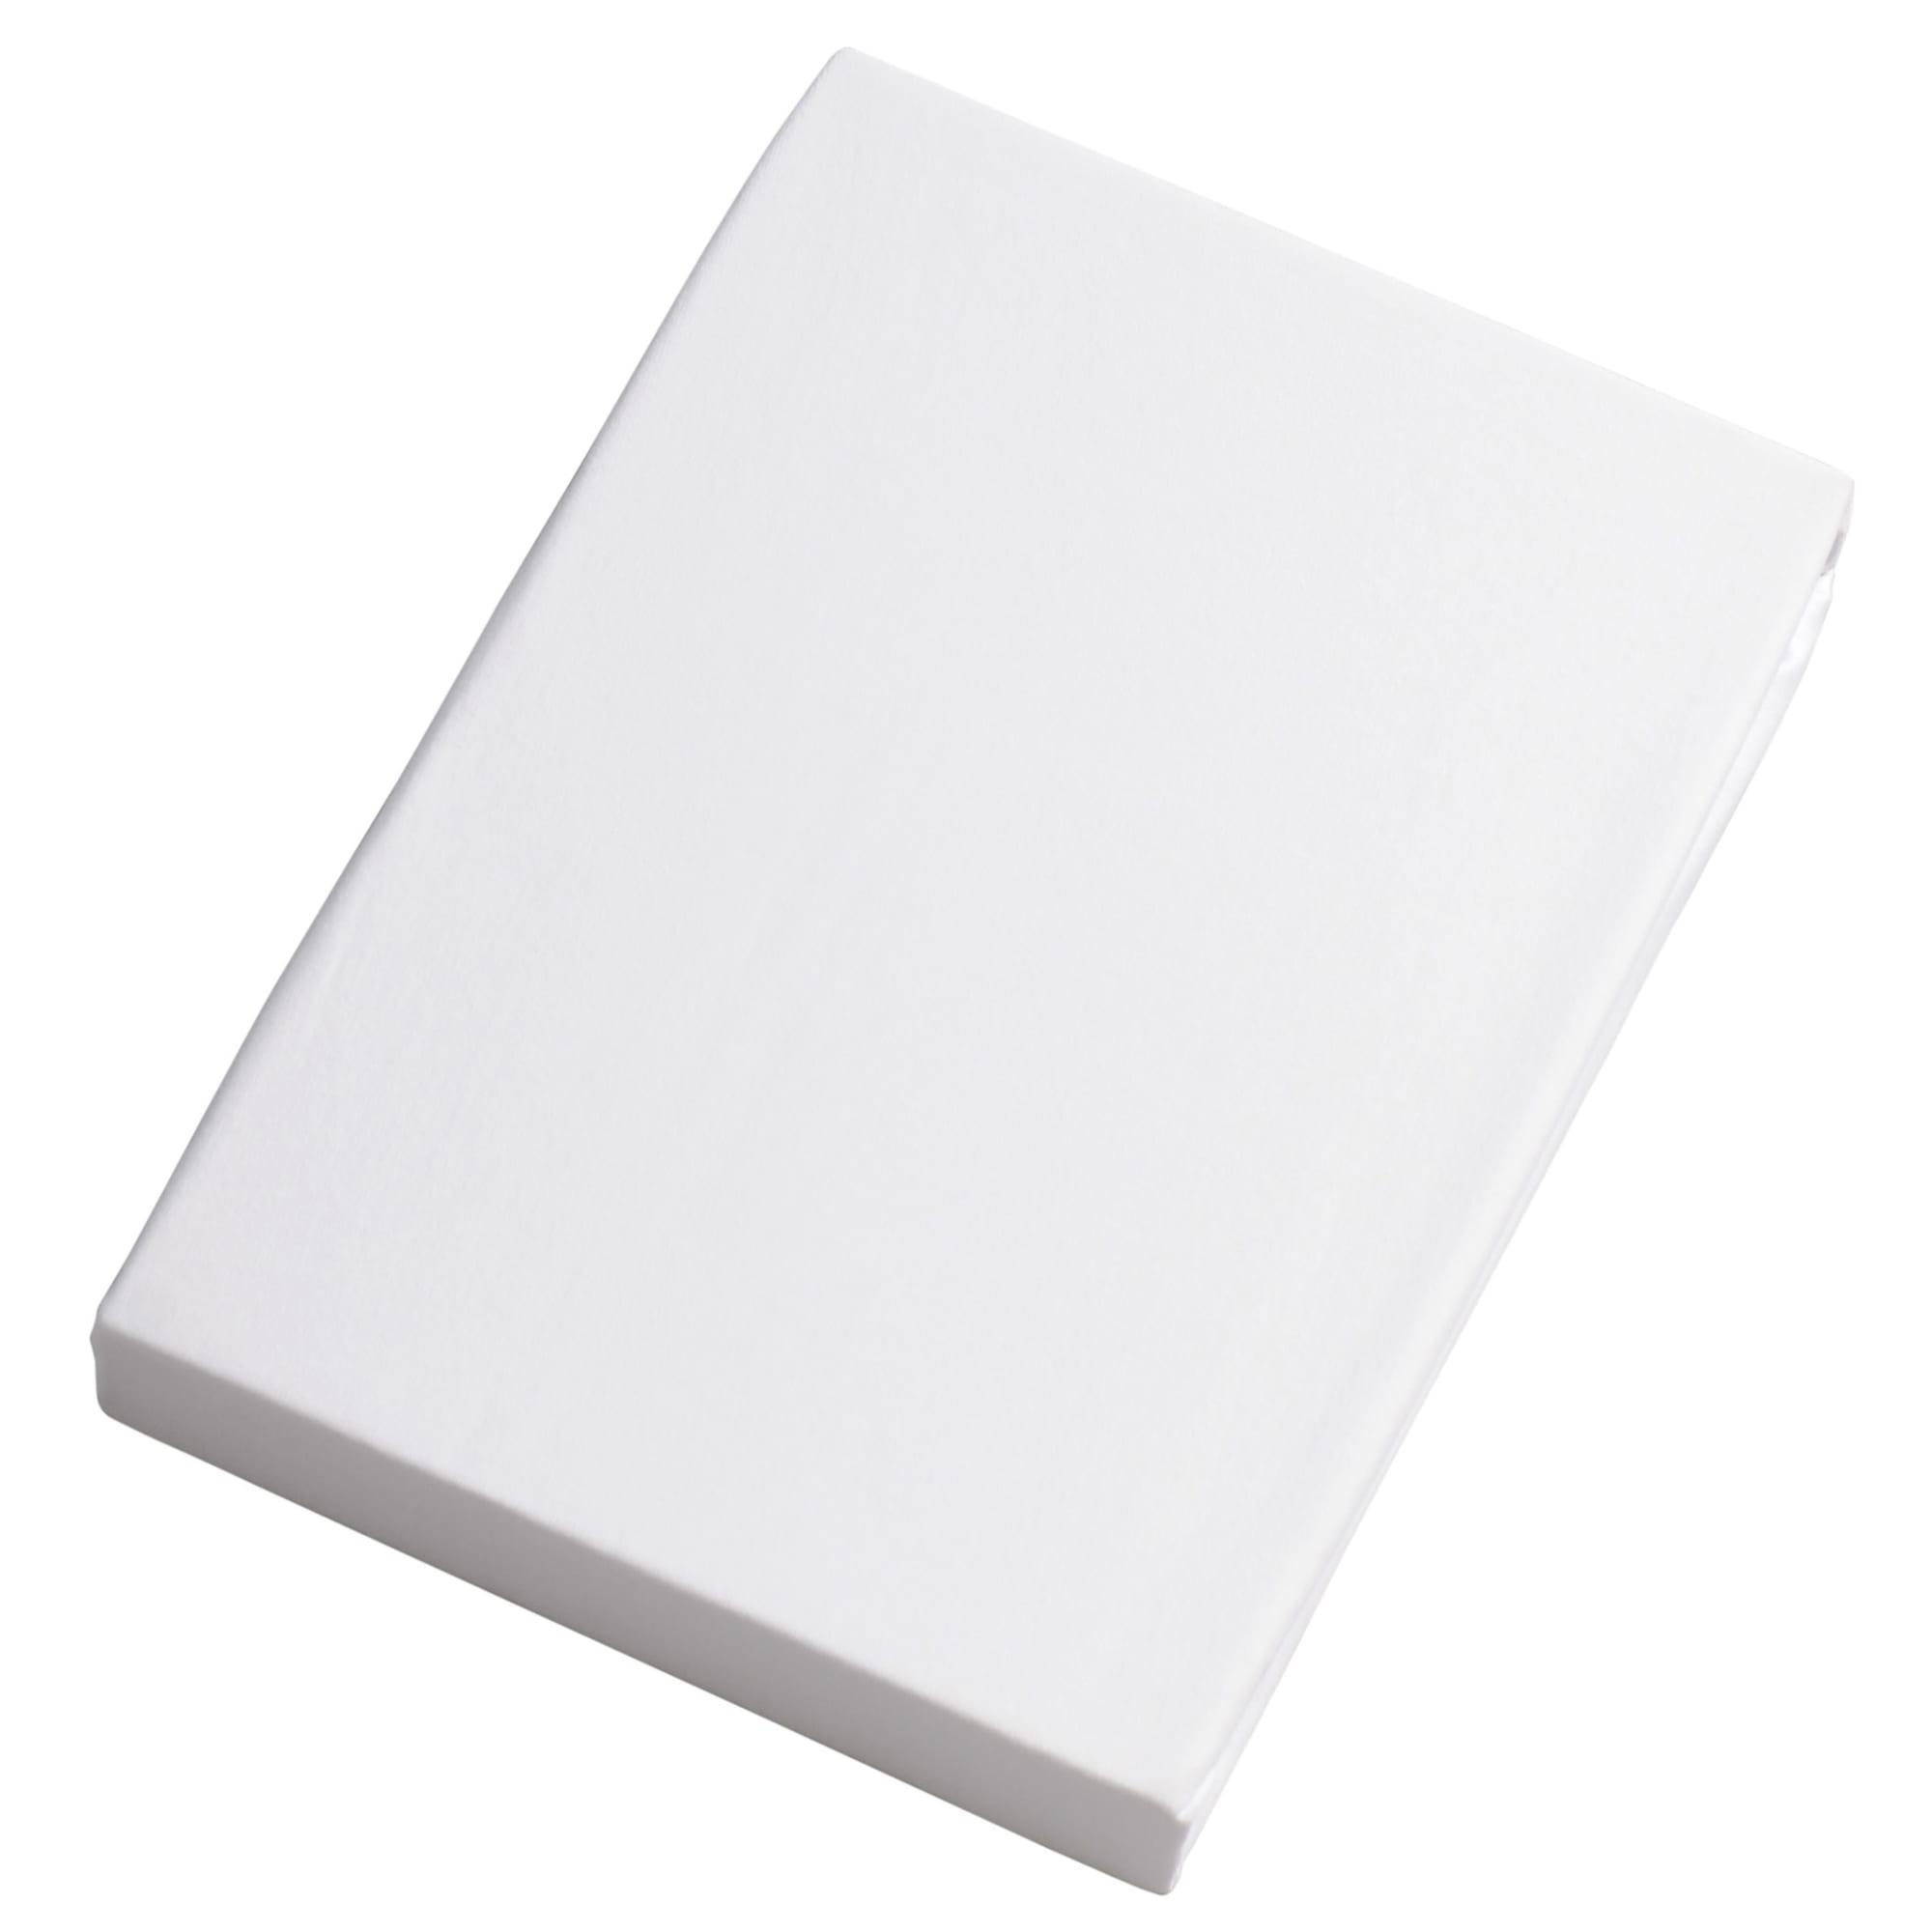 Bomuld/elastan - 160 x 200 x 27 cm